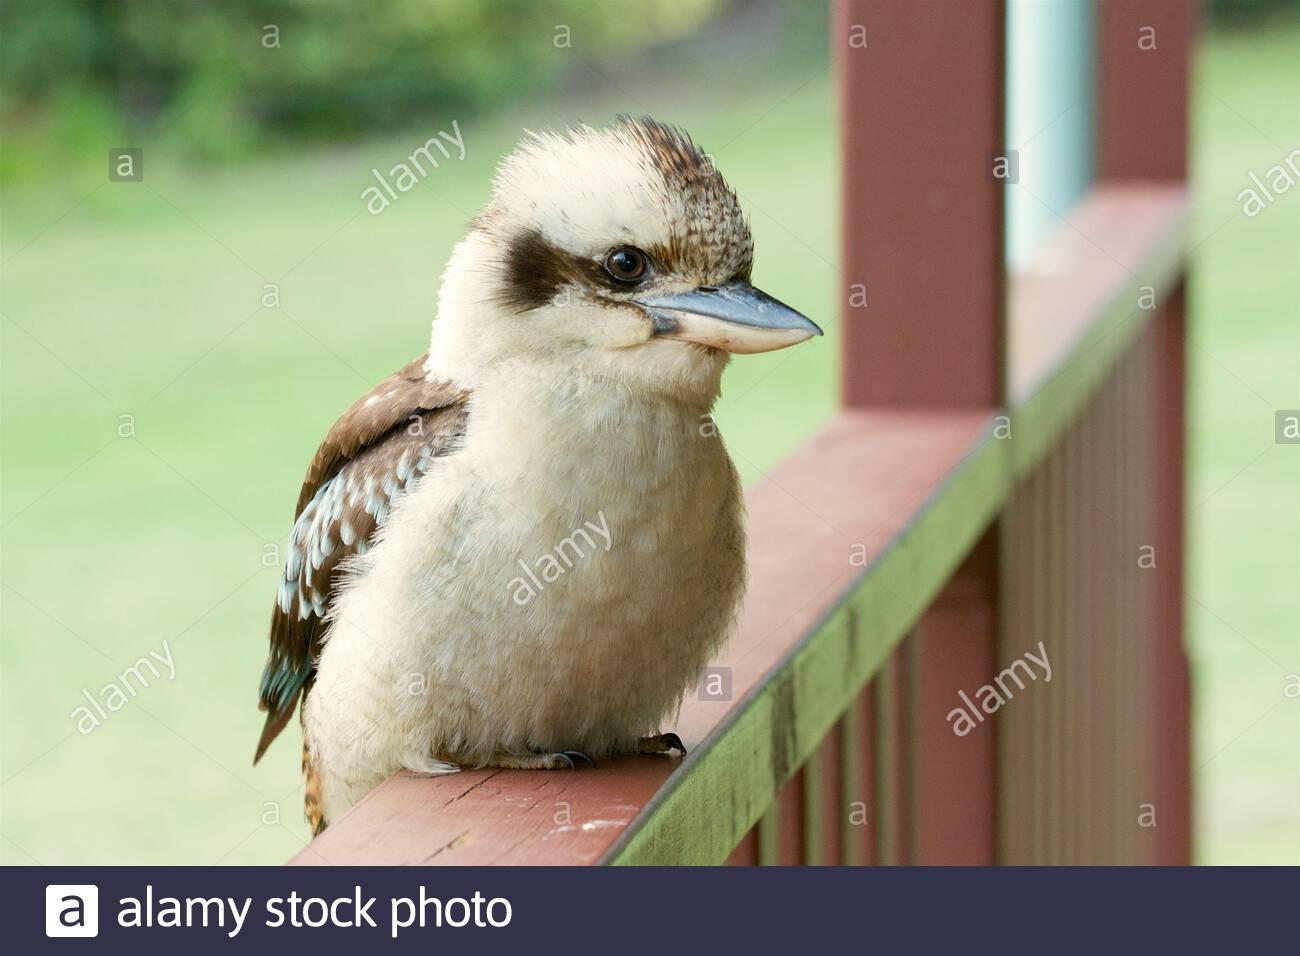 portrait-of-a-laughing-kookaburra-dacelo-novaeguineae-2EXAHD4.jpg